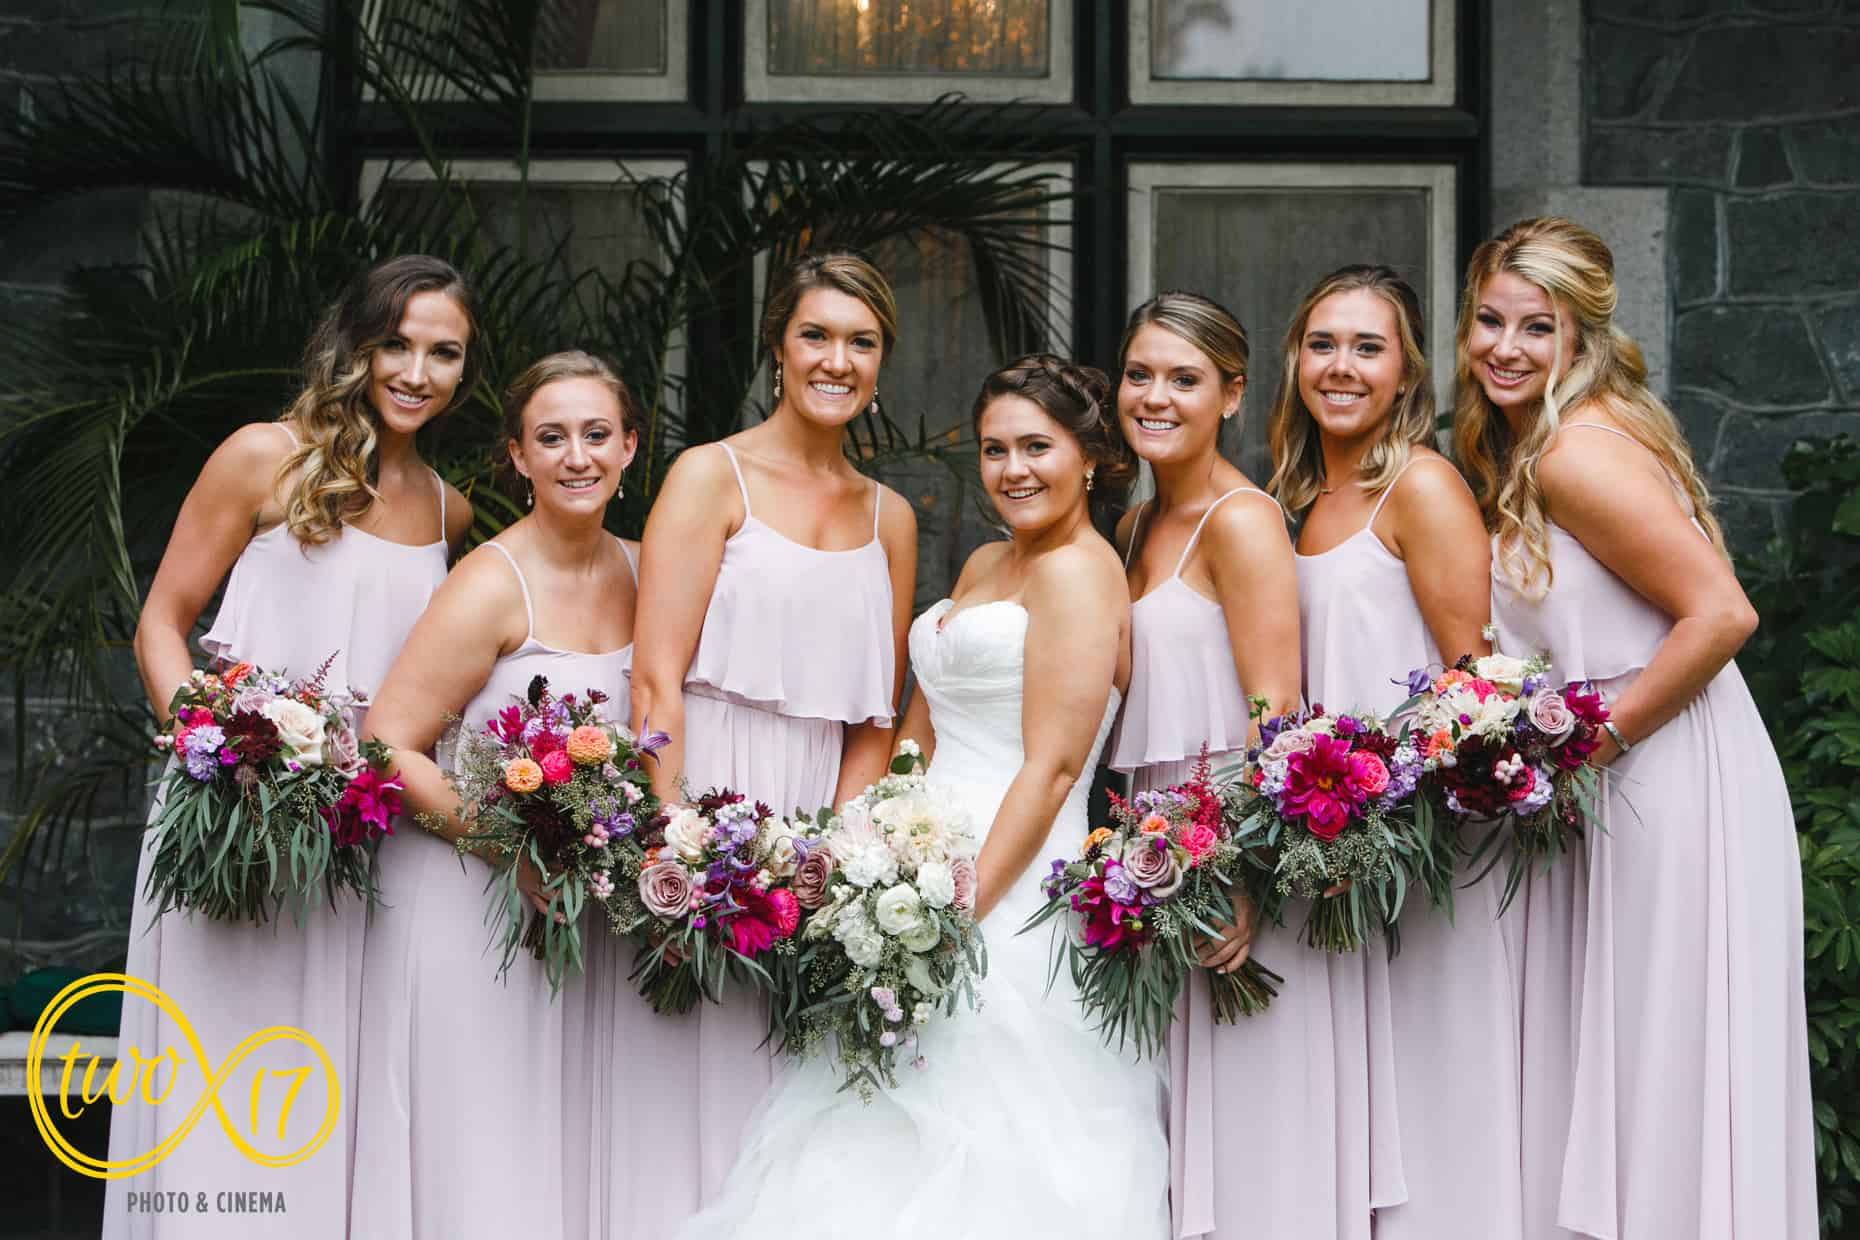 Philadelphia area wedding receptions